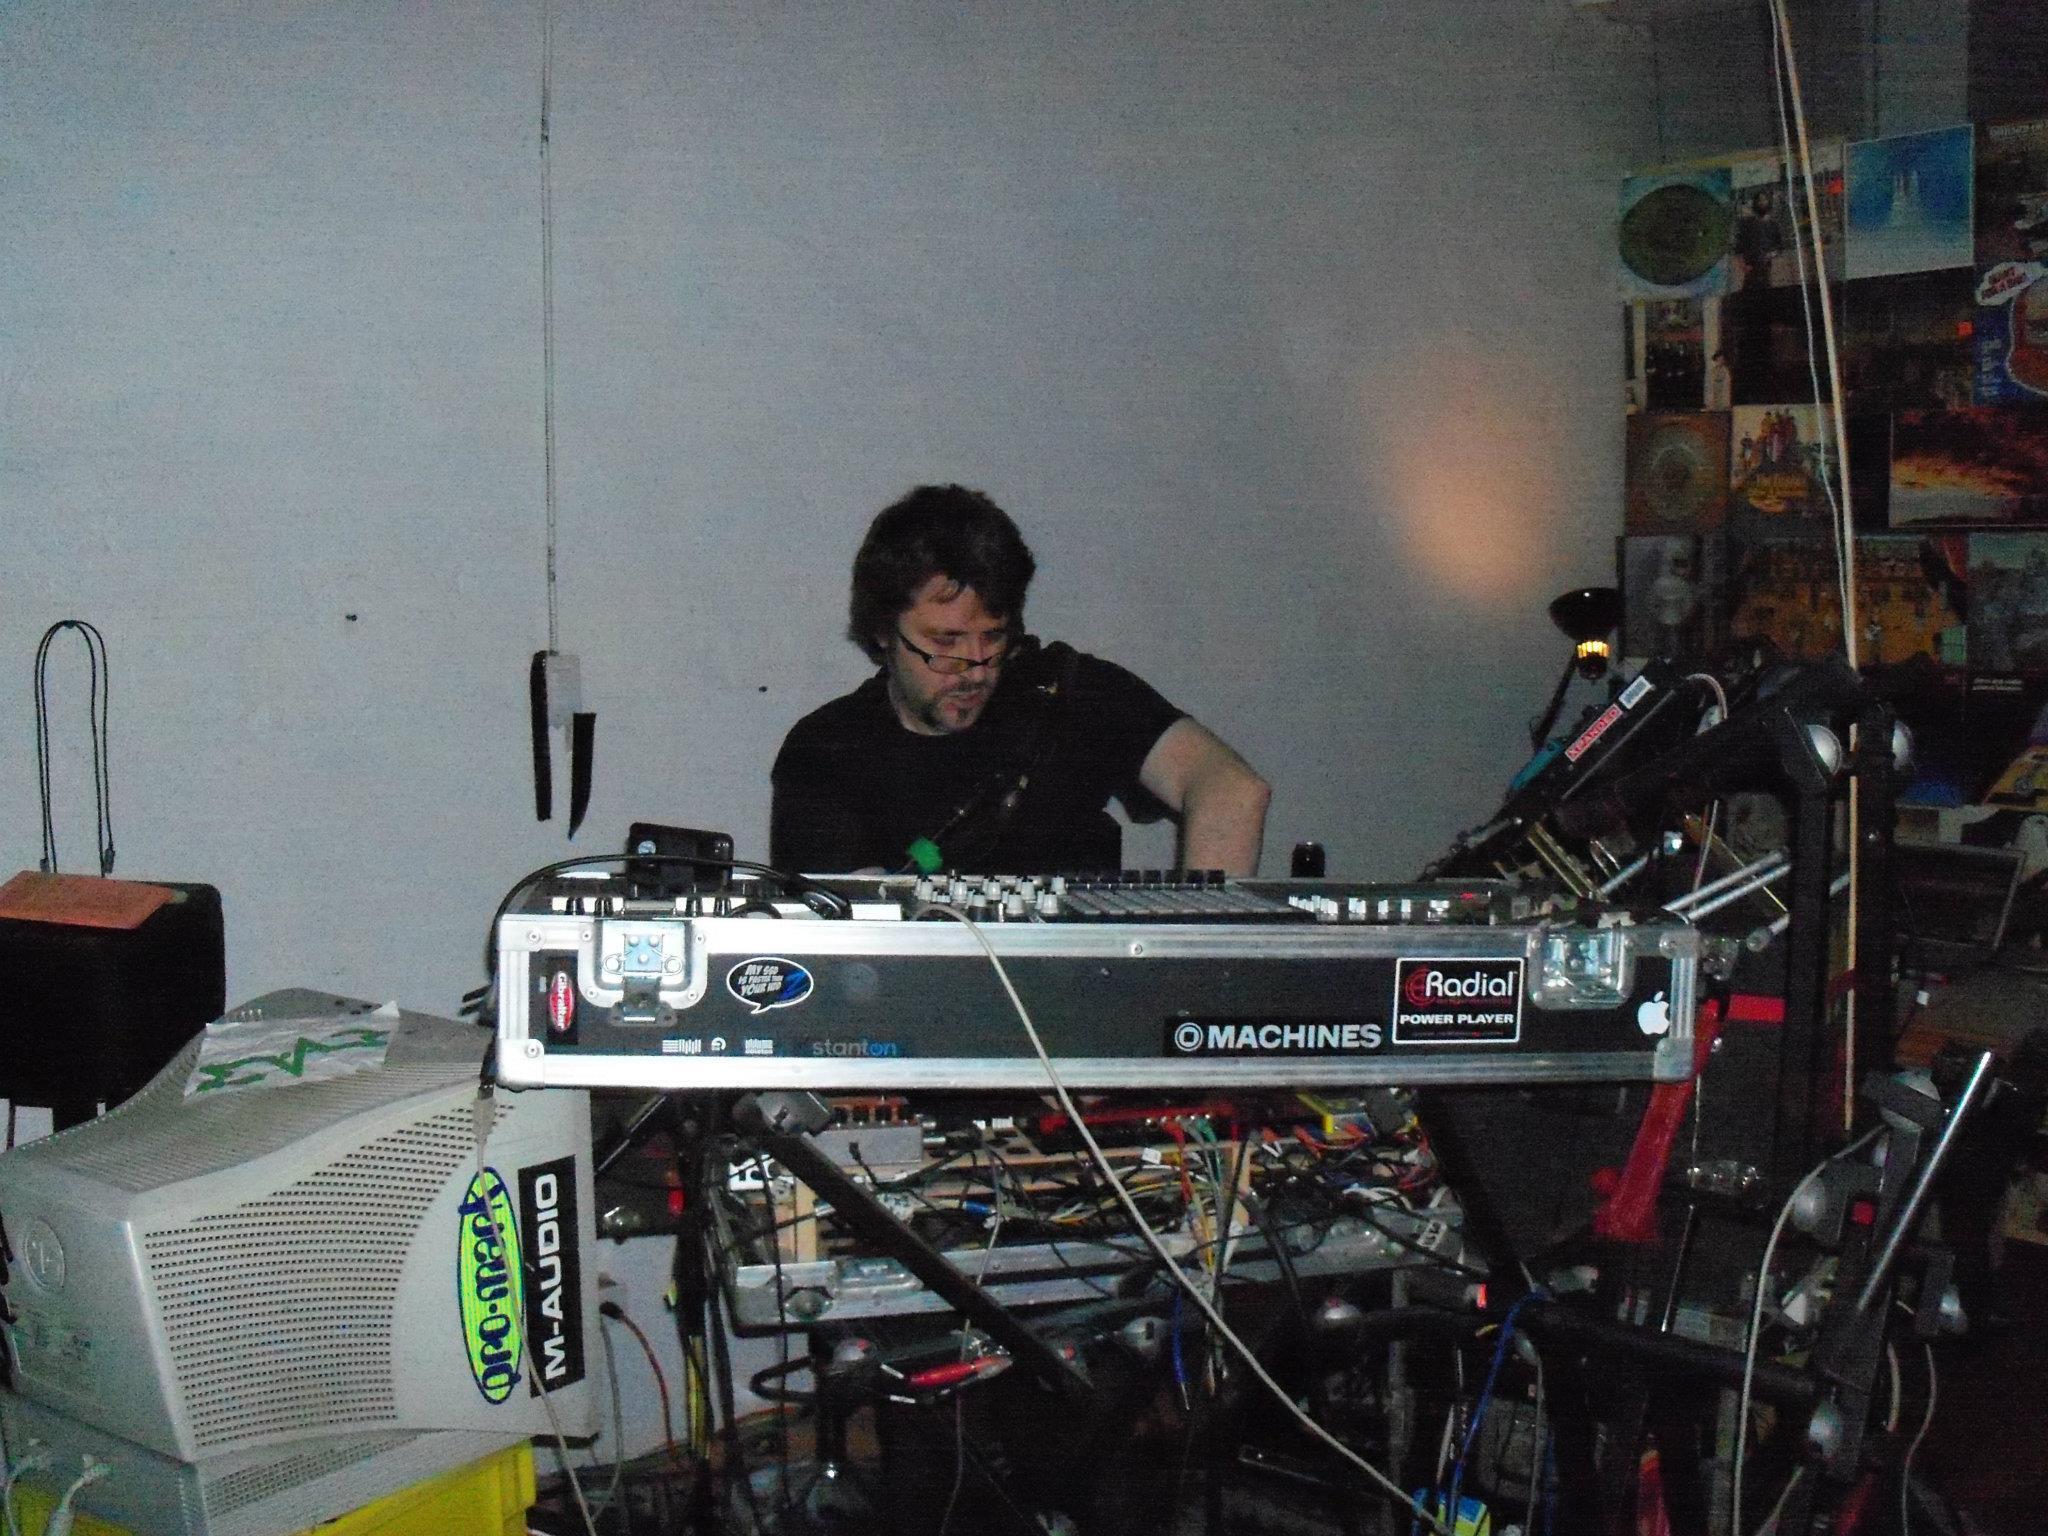 Muzik 4 Machines